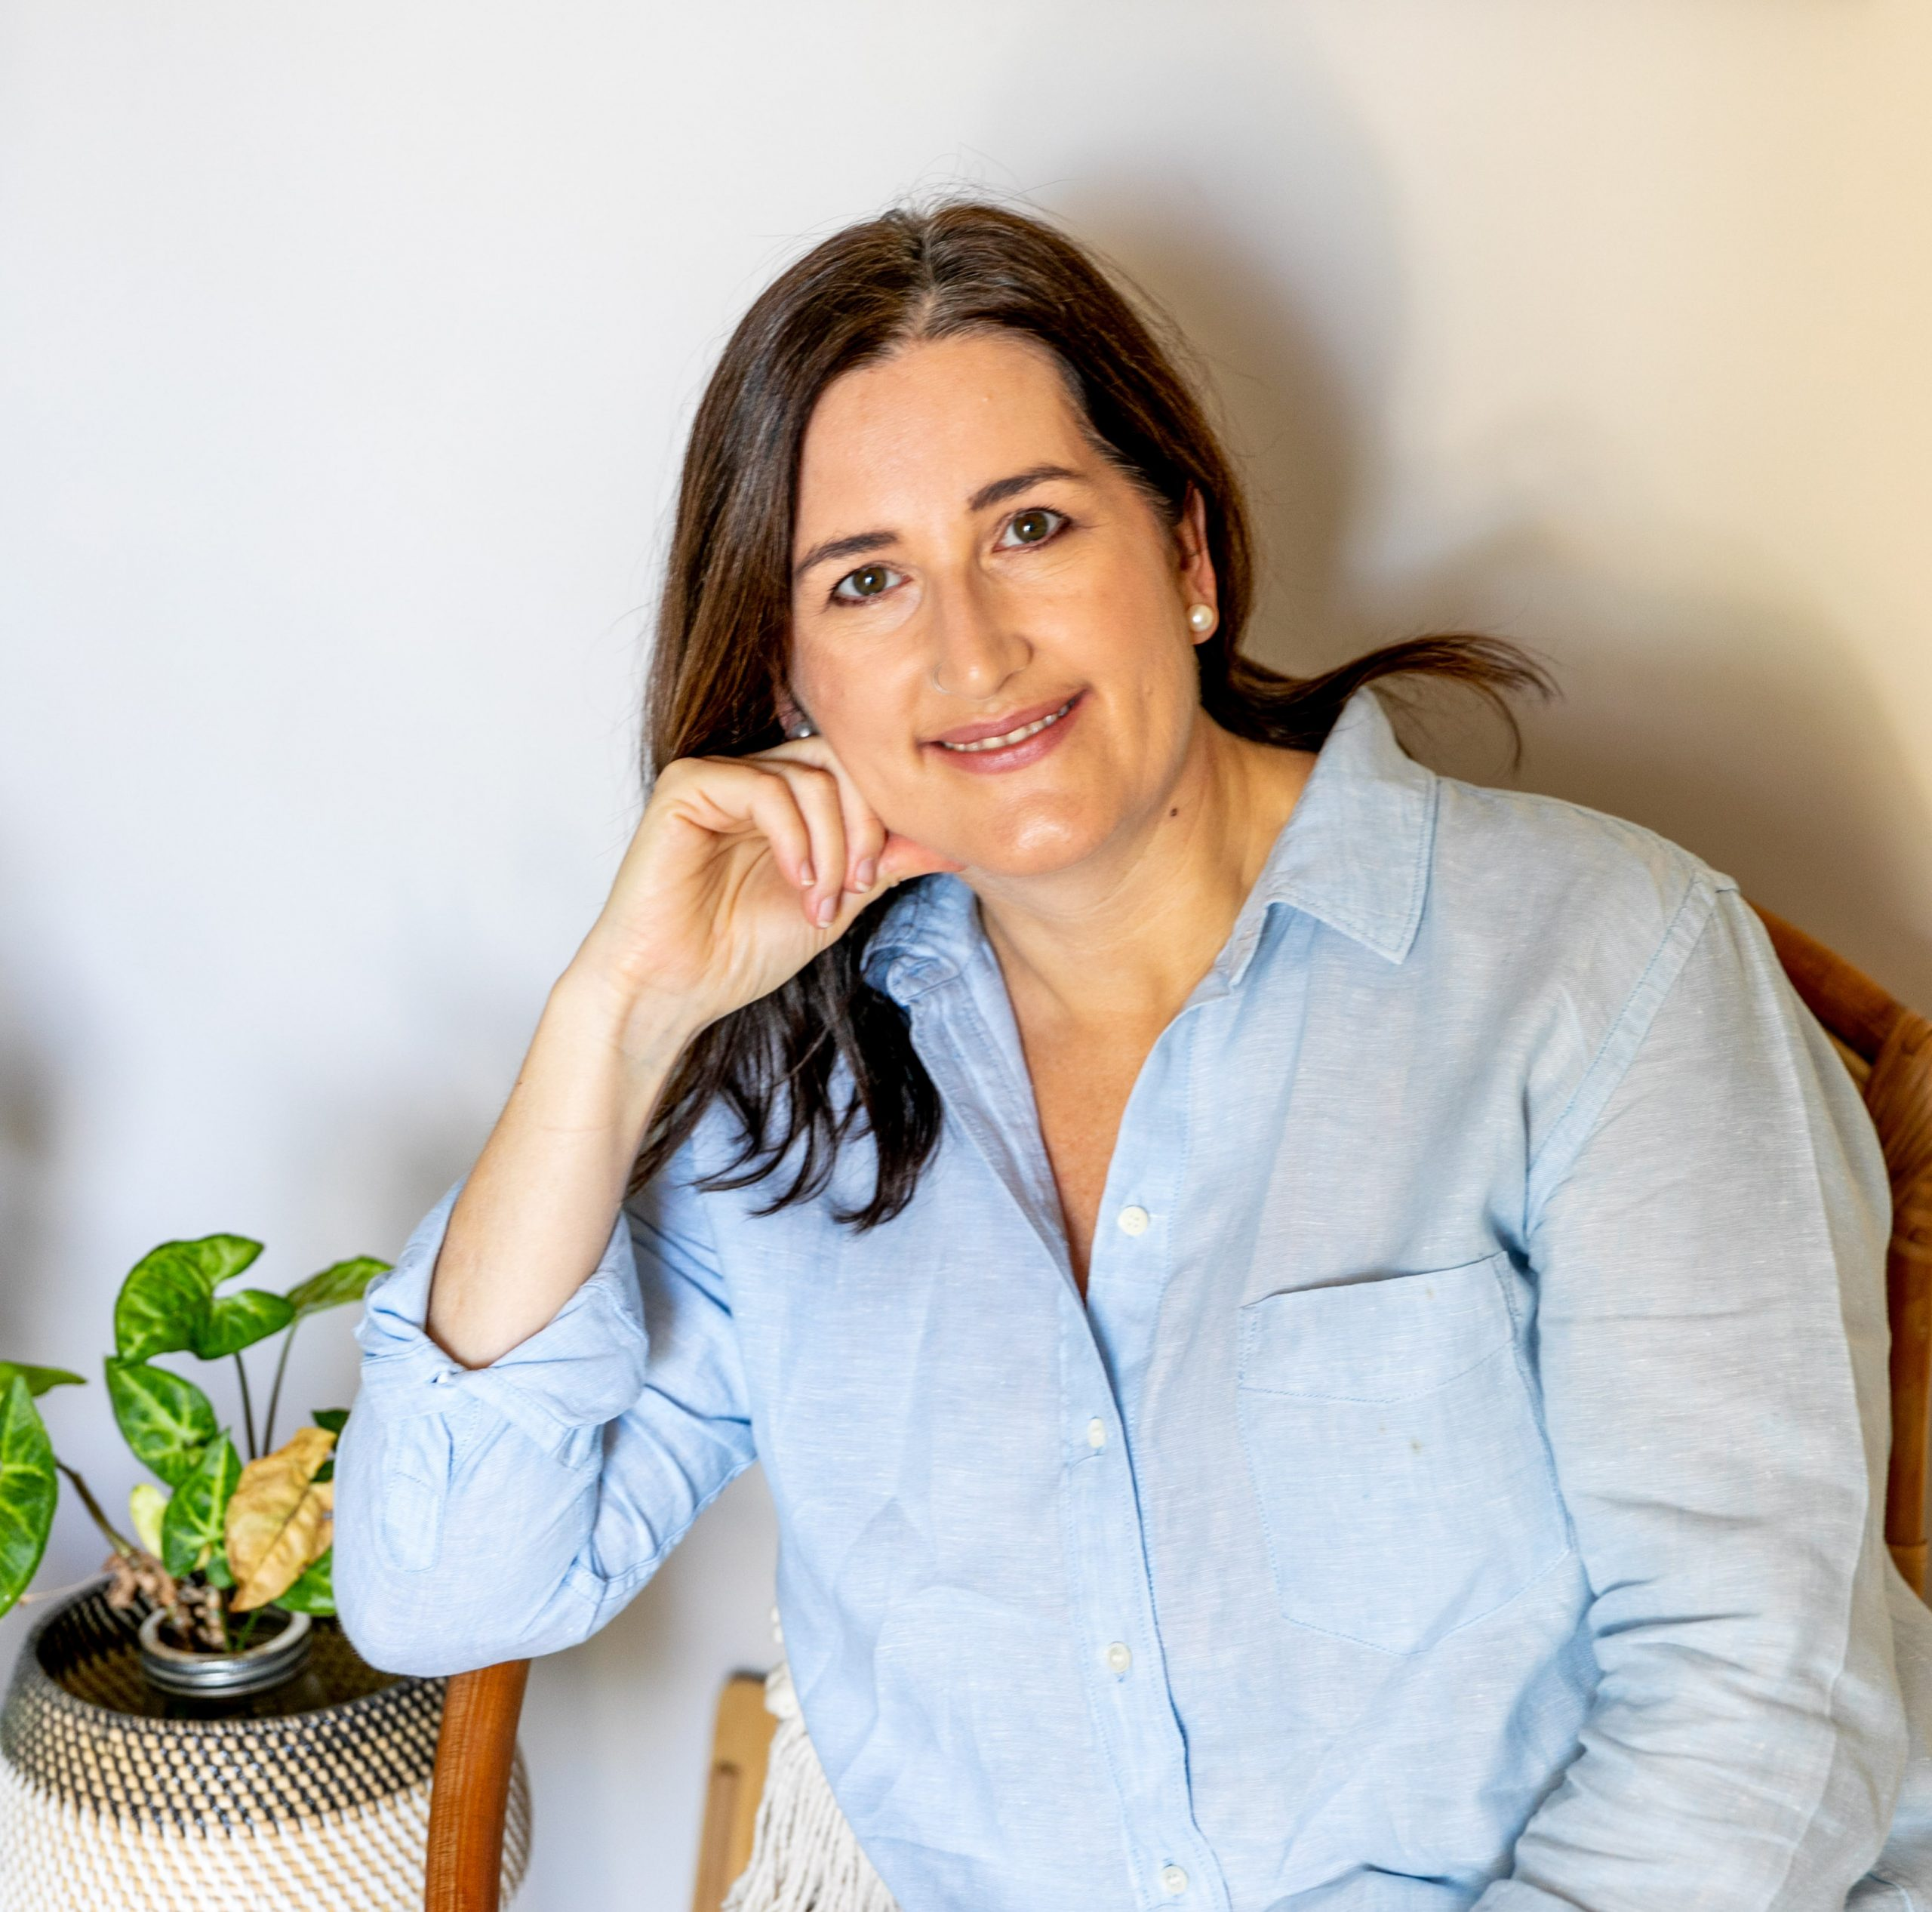 Dr Tarmala Caple, The Wellbeing Psychologist